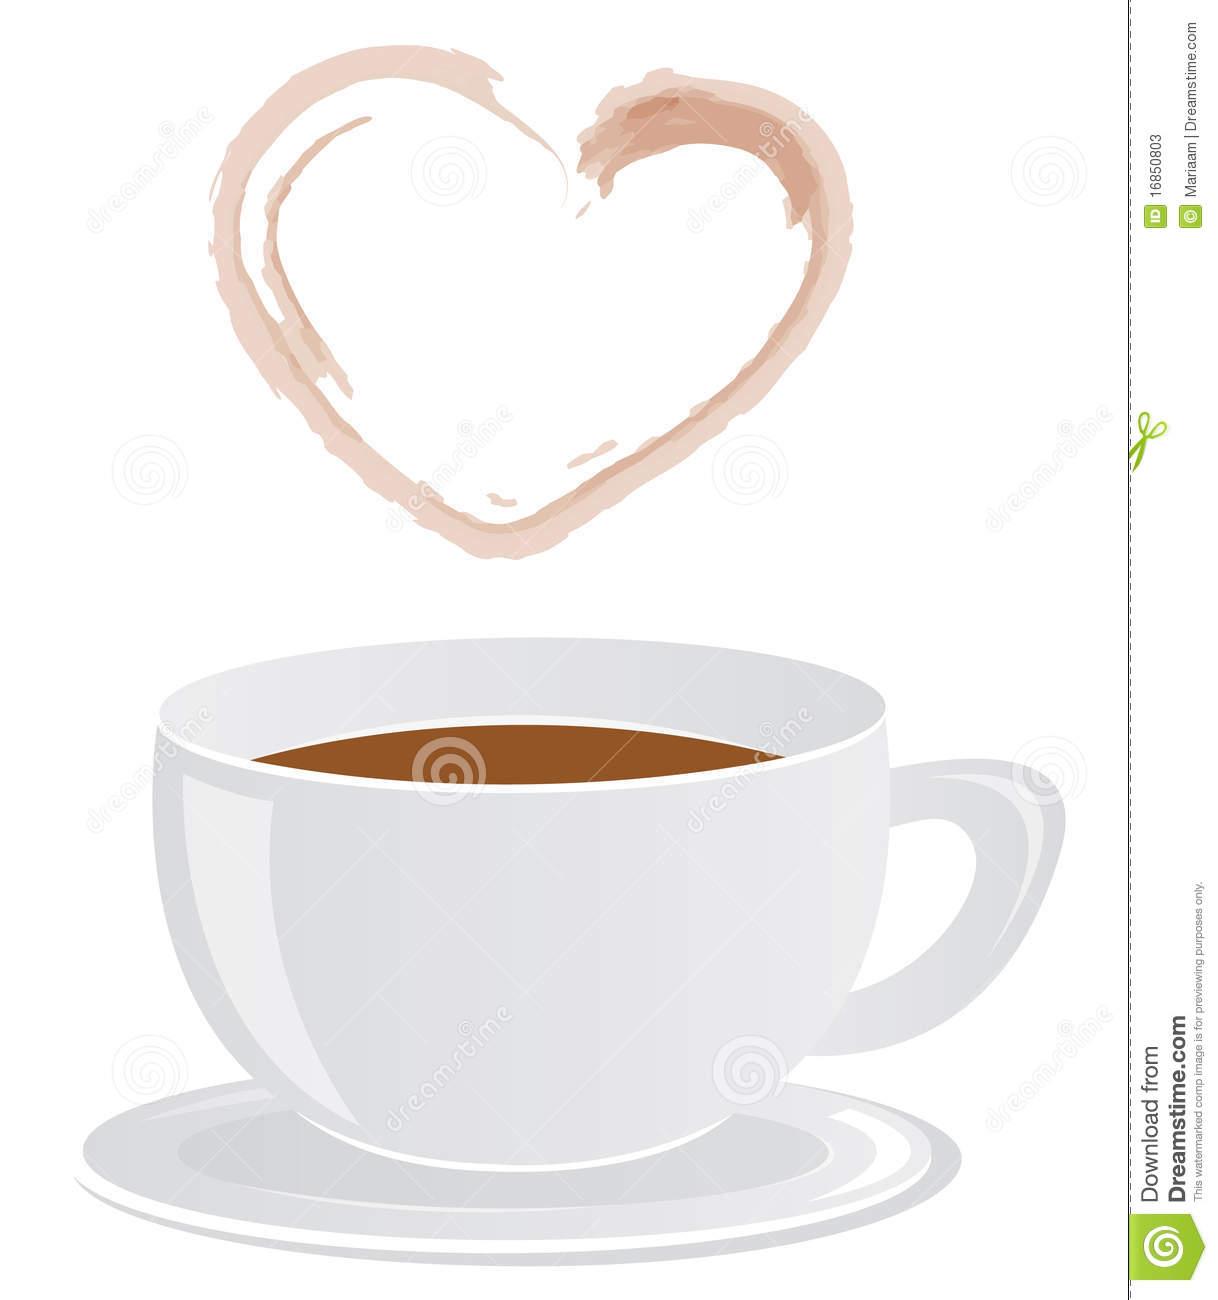 Coffee Cup & Heart.